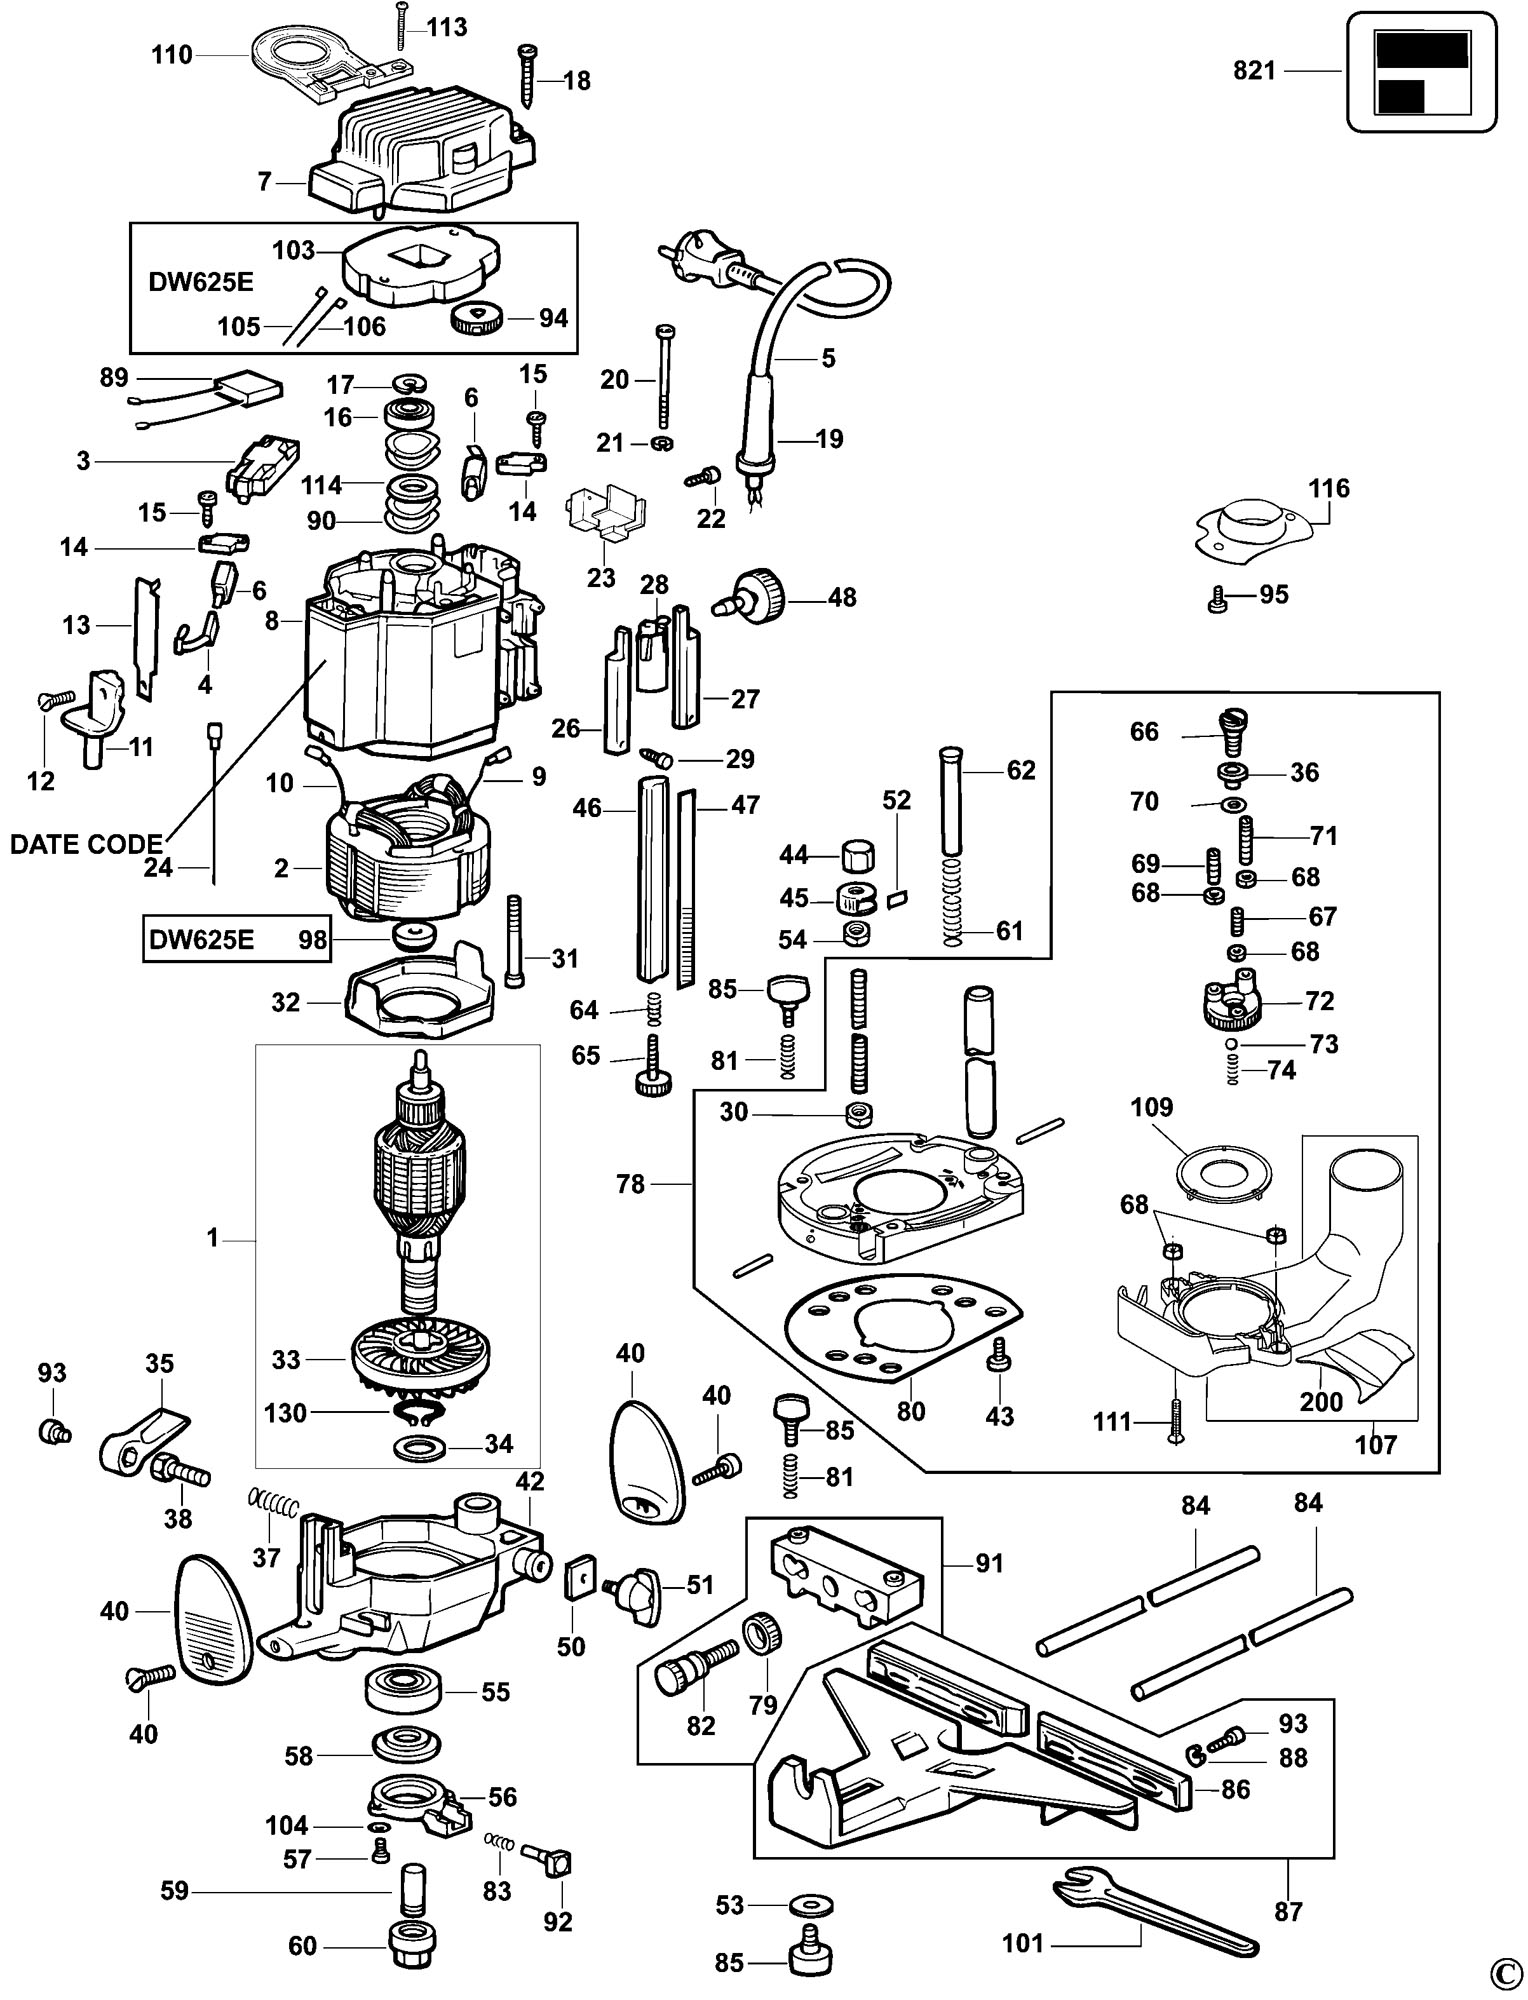 Spares For Dewalt Dw625e Router Type 6 Spare Dw625e Type